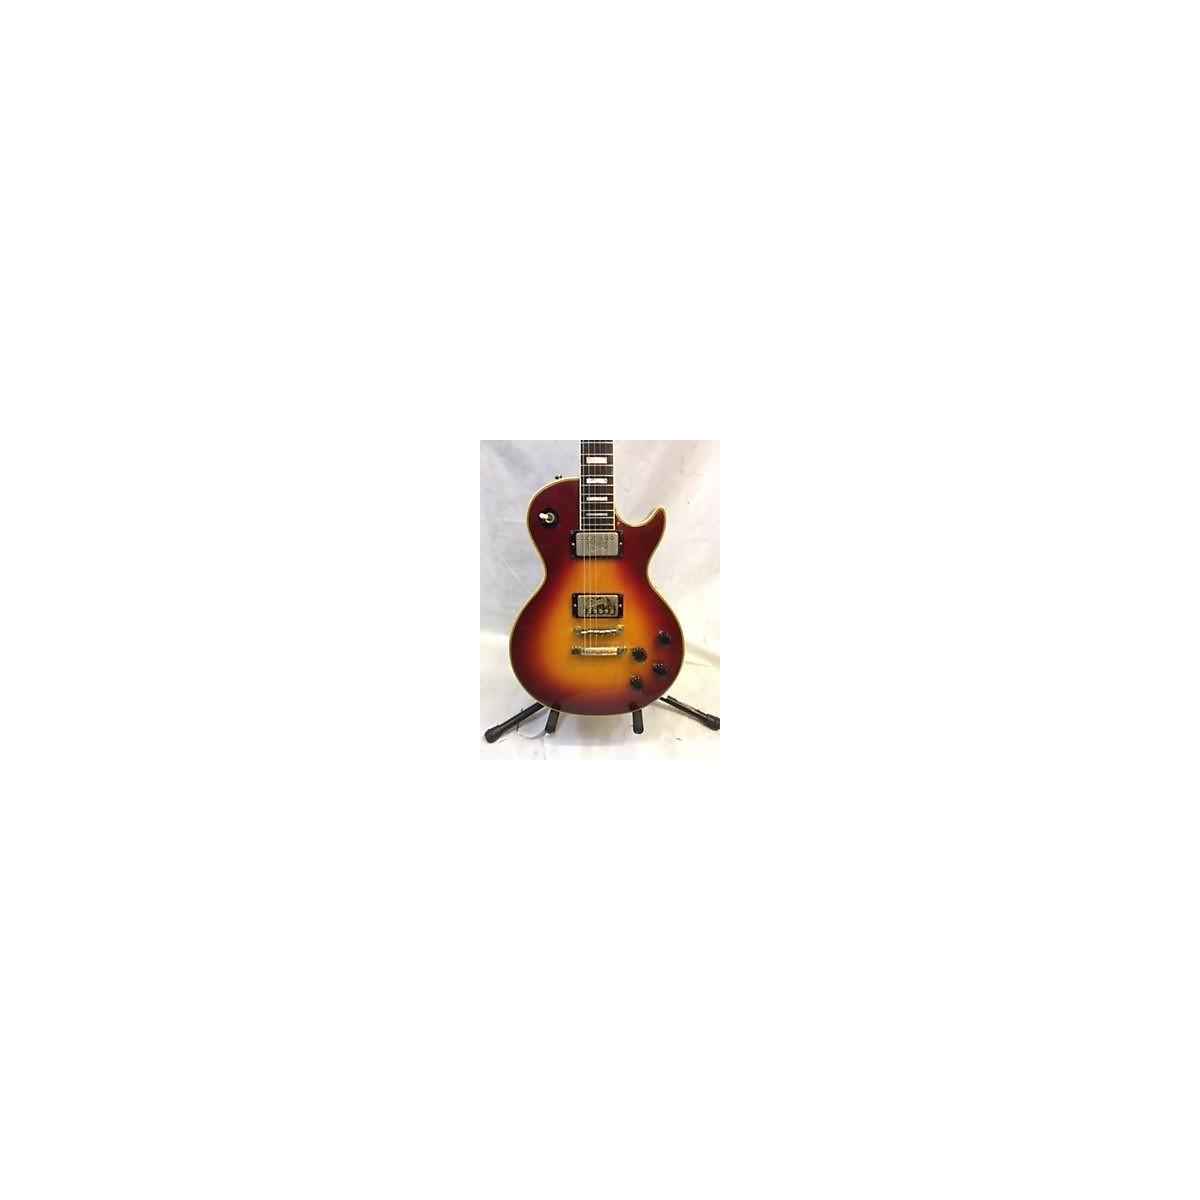 Gibson 1972 Les Paul Custom Solid Body Electric Guitar